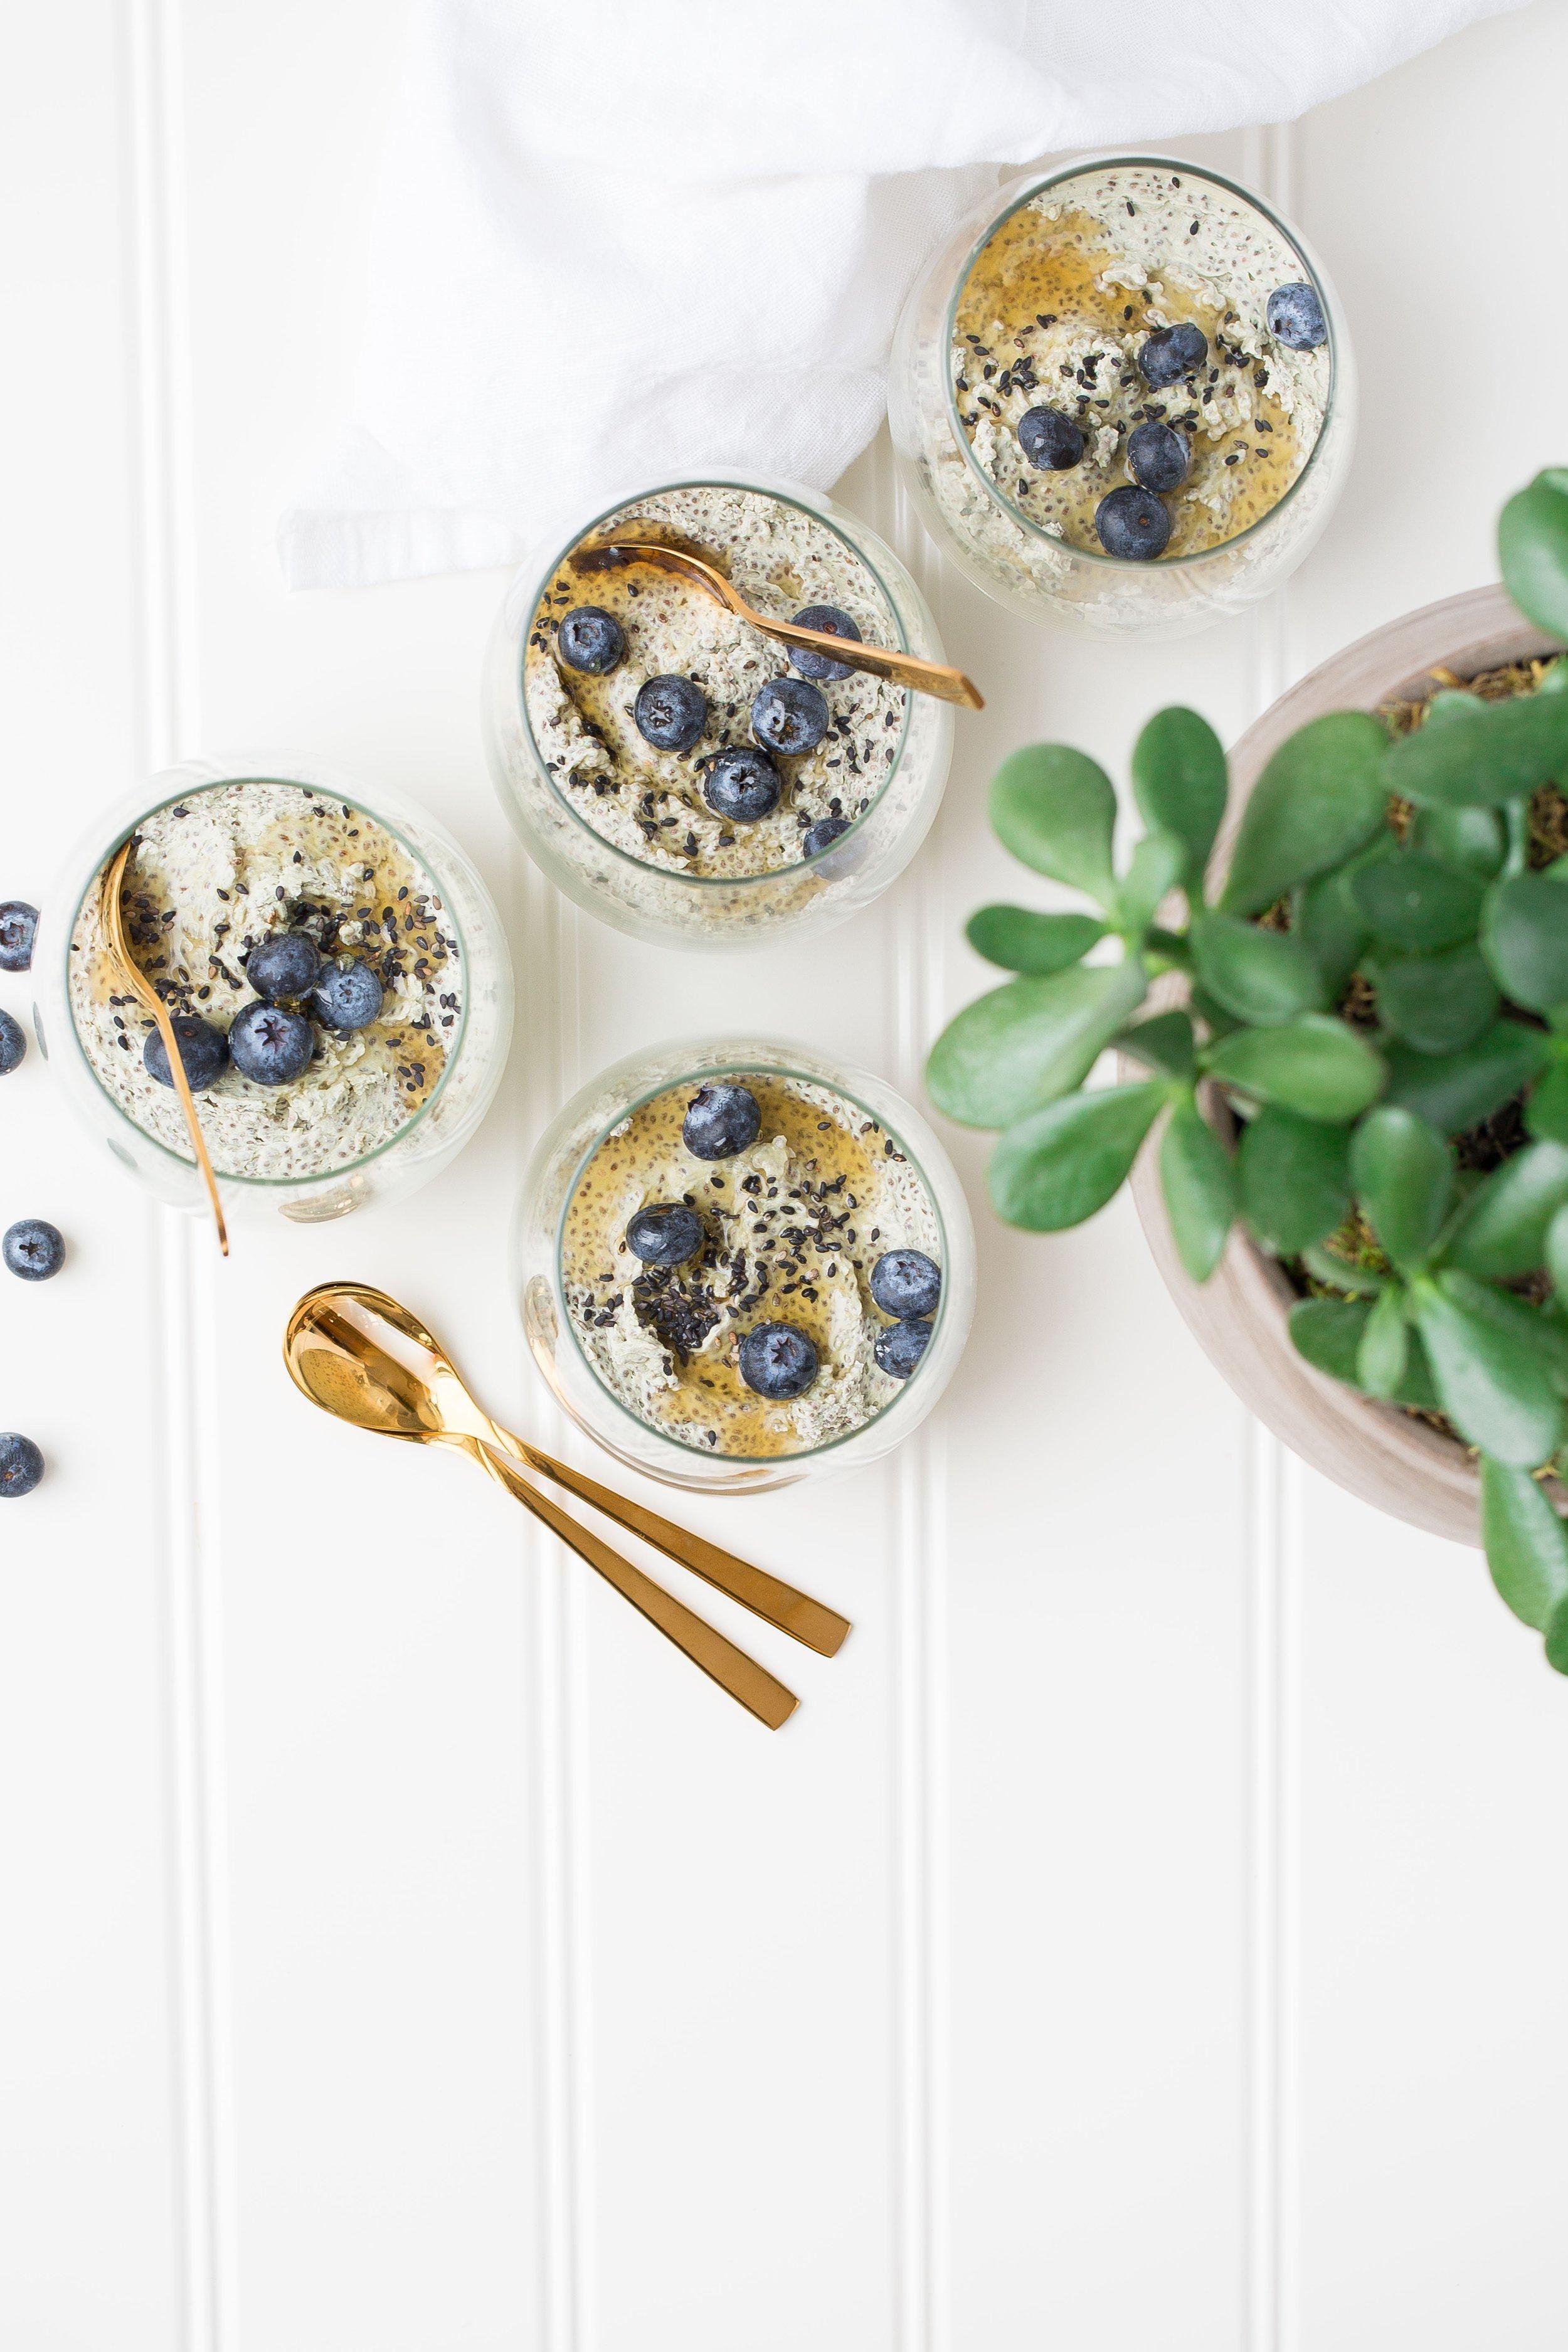 Fat Loss Foodies Vanilla Chia Protein Pudding.jpg